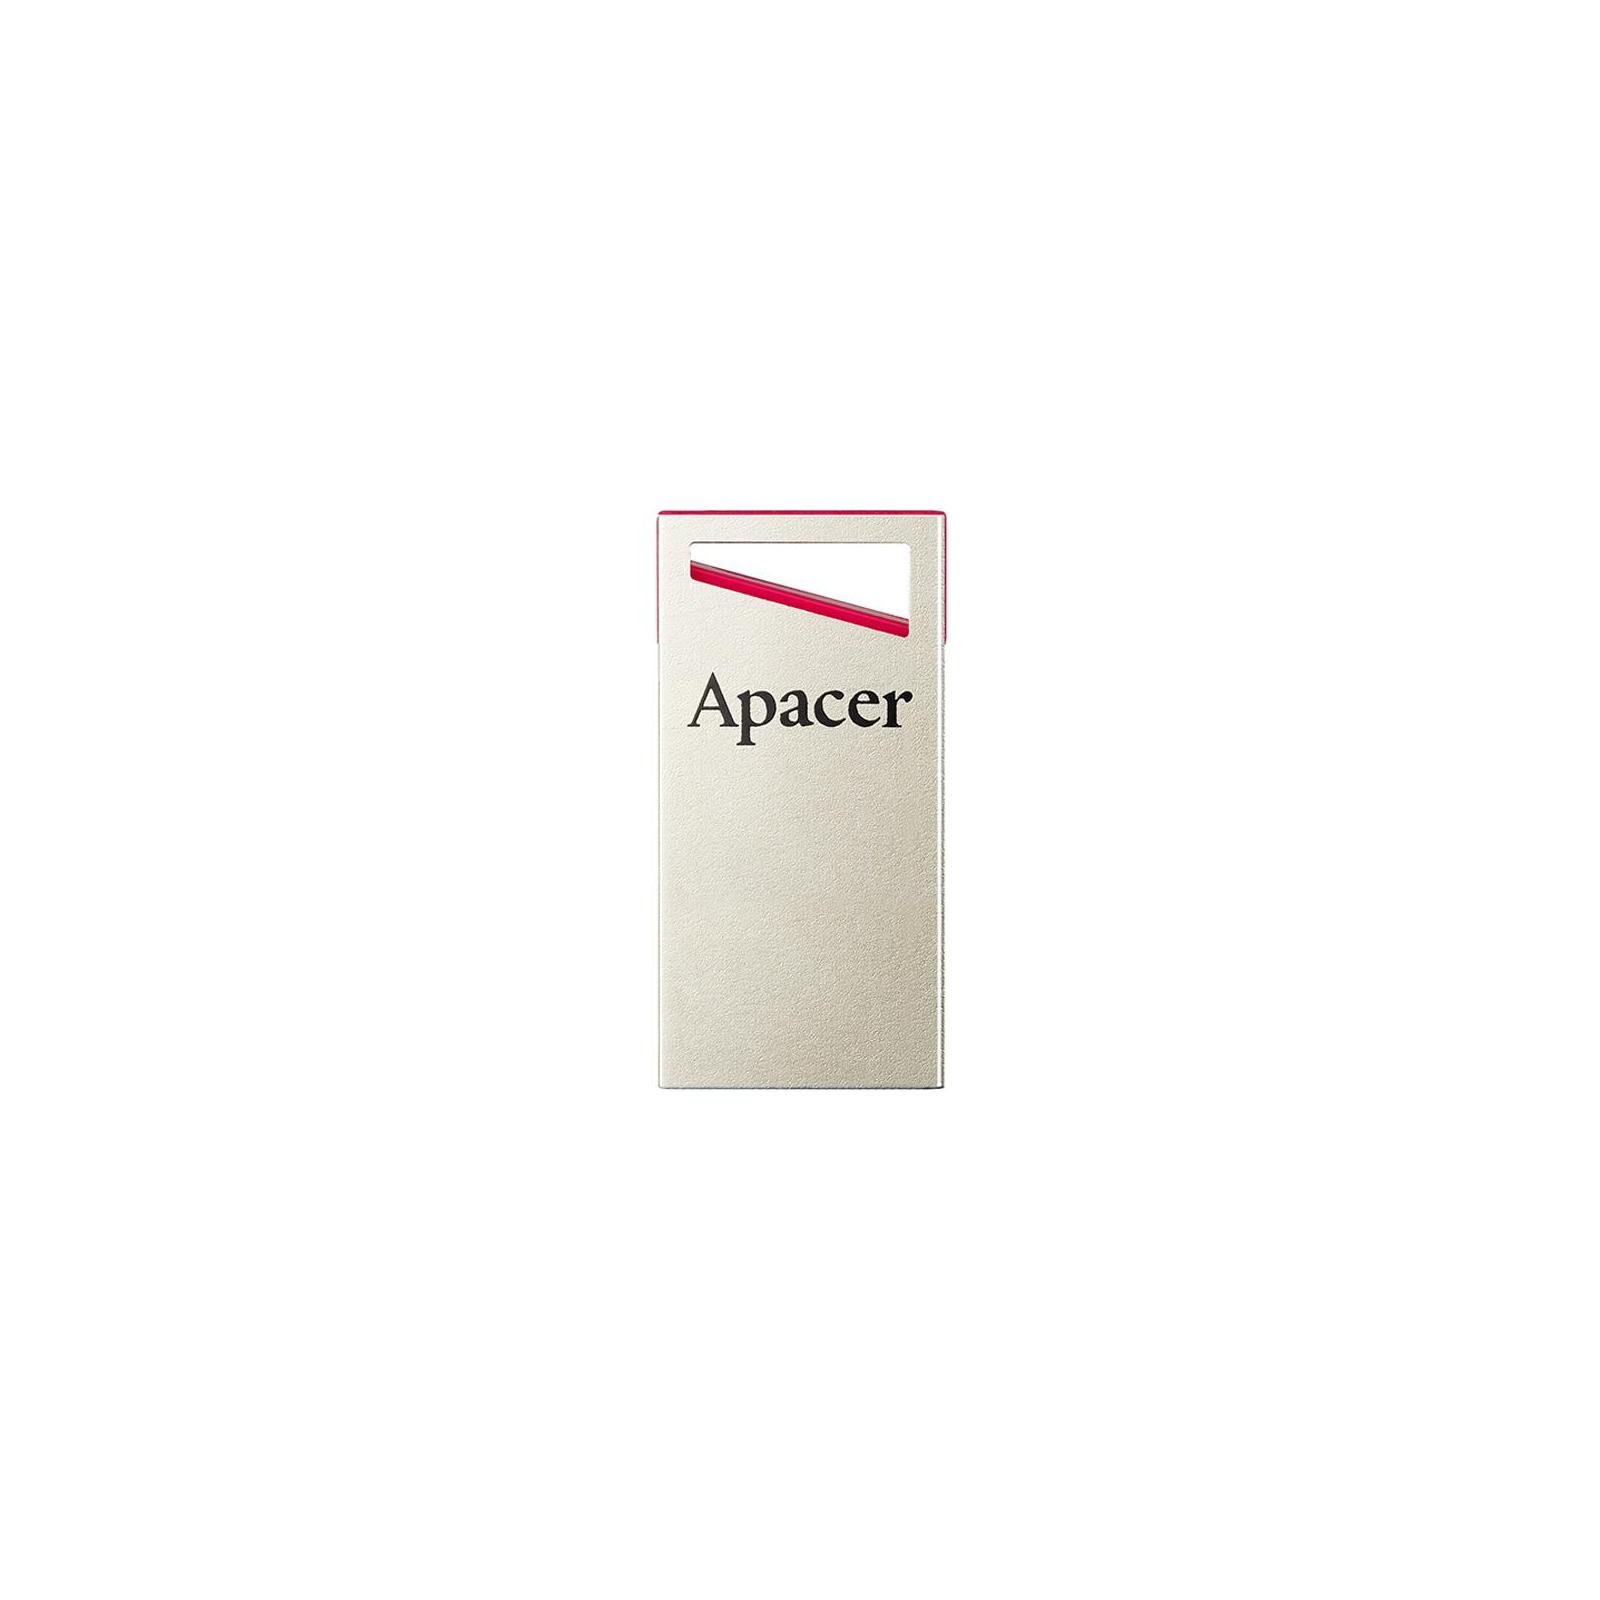 USB флеш накопитель Apacer 64GB AH112 Red USB 2.0 (AP64GAH112R-1) изображение 2